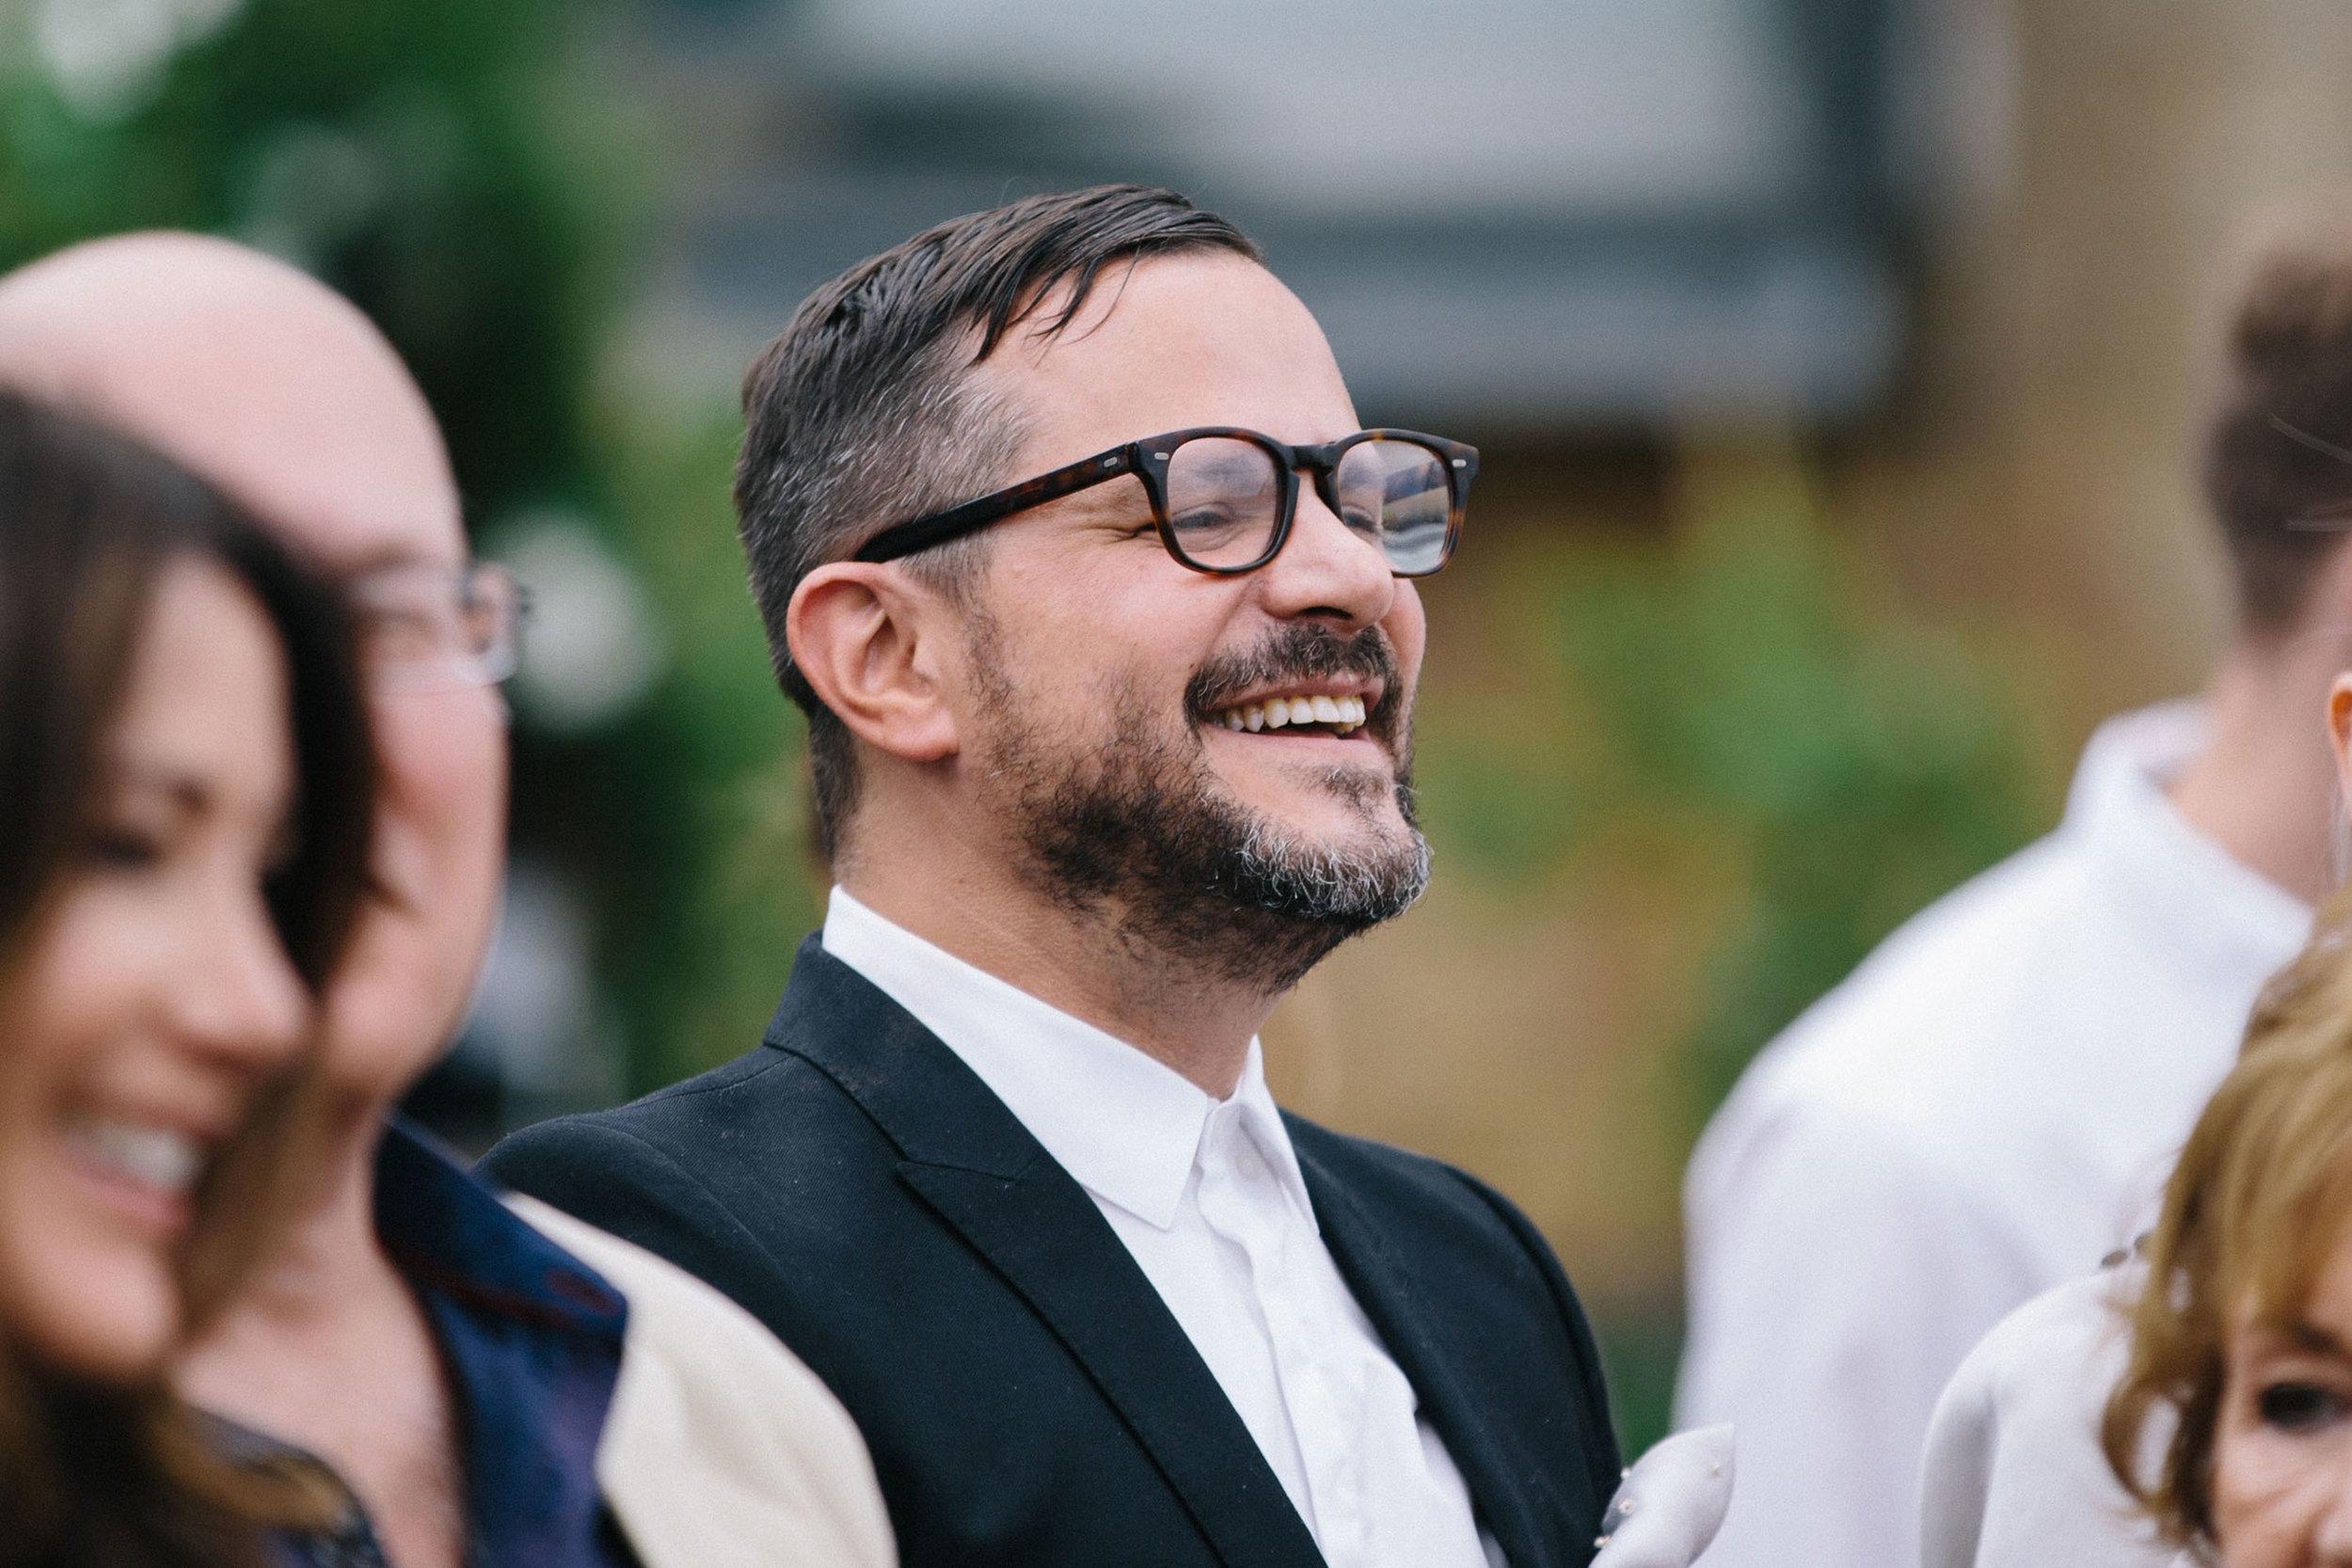 West-London-wedding-party-in-Ladbroke-Grove-Michael-Newington-Gray-44.jpg